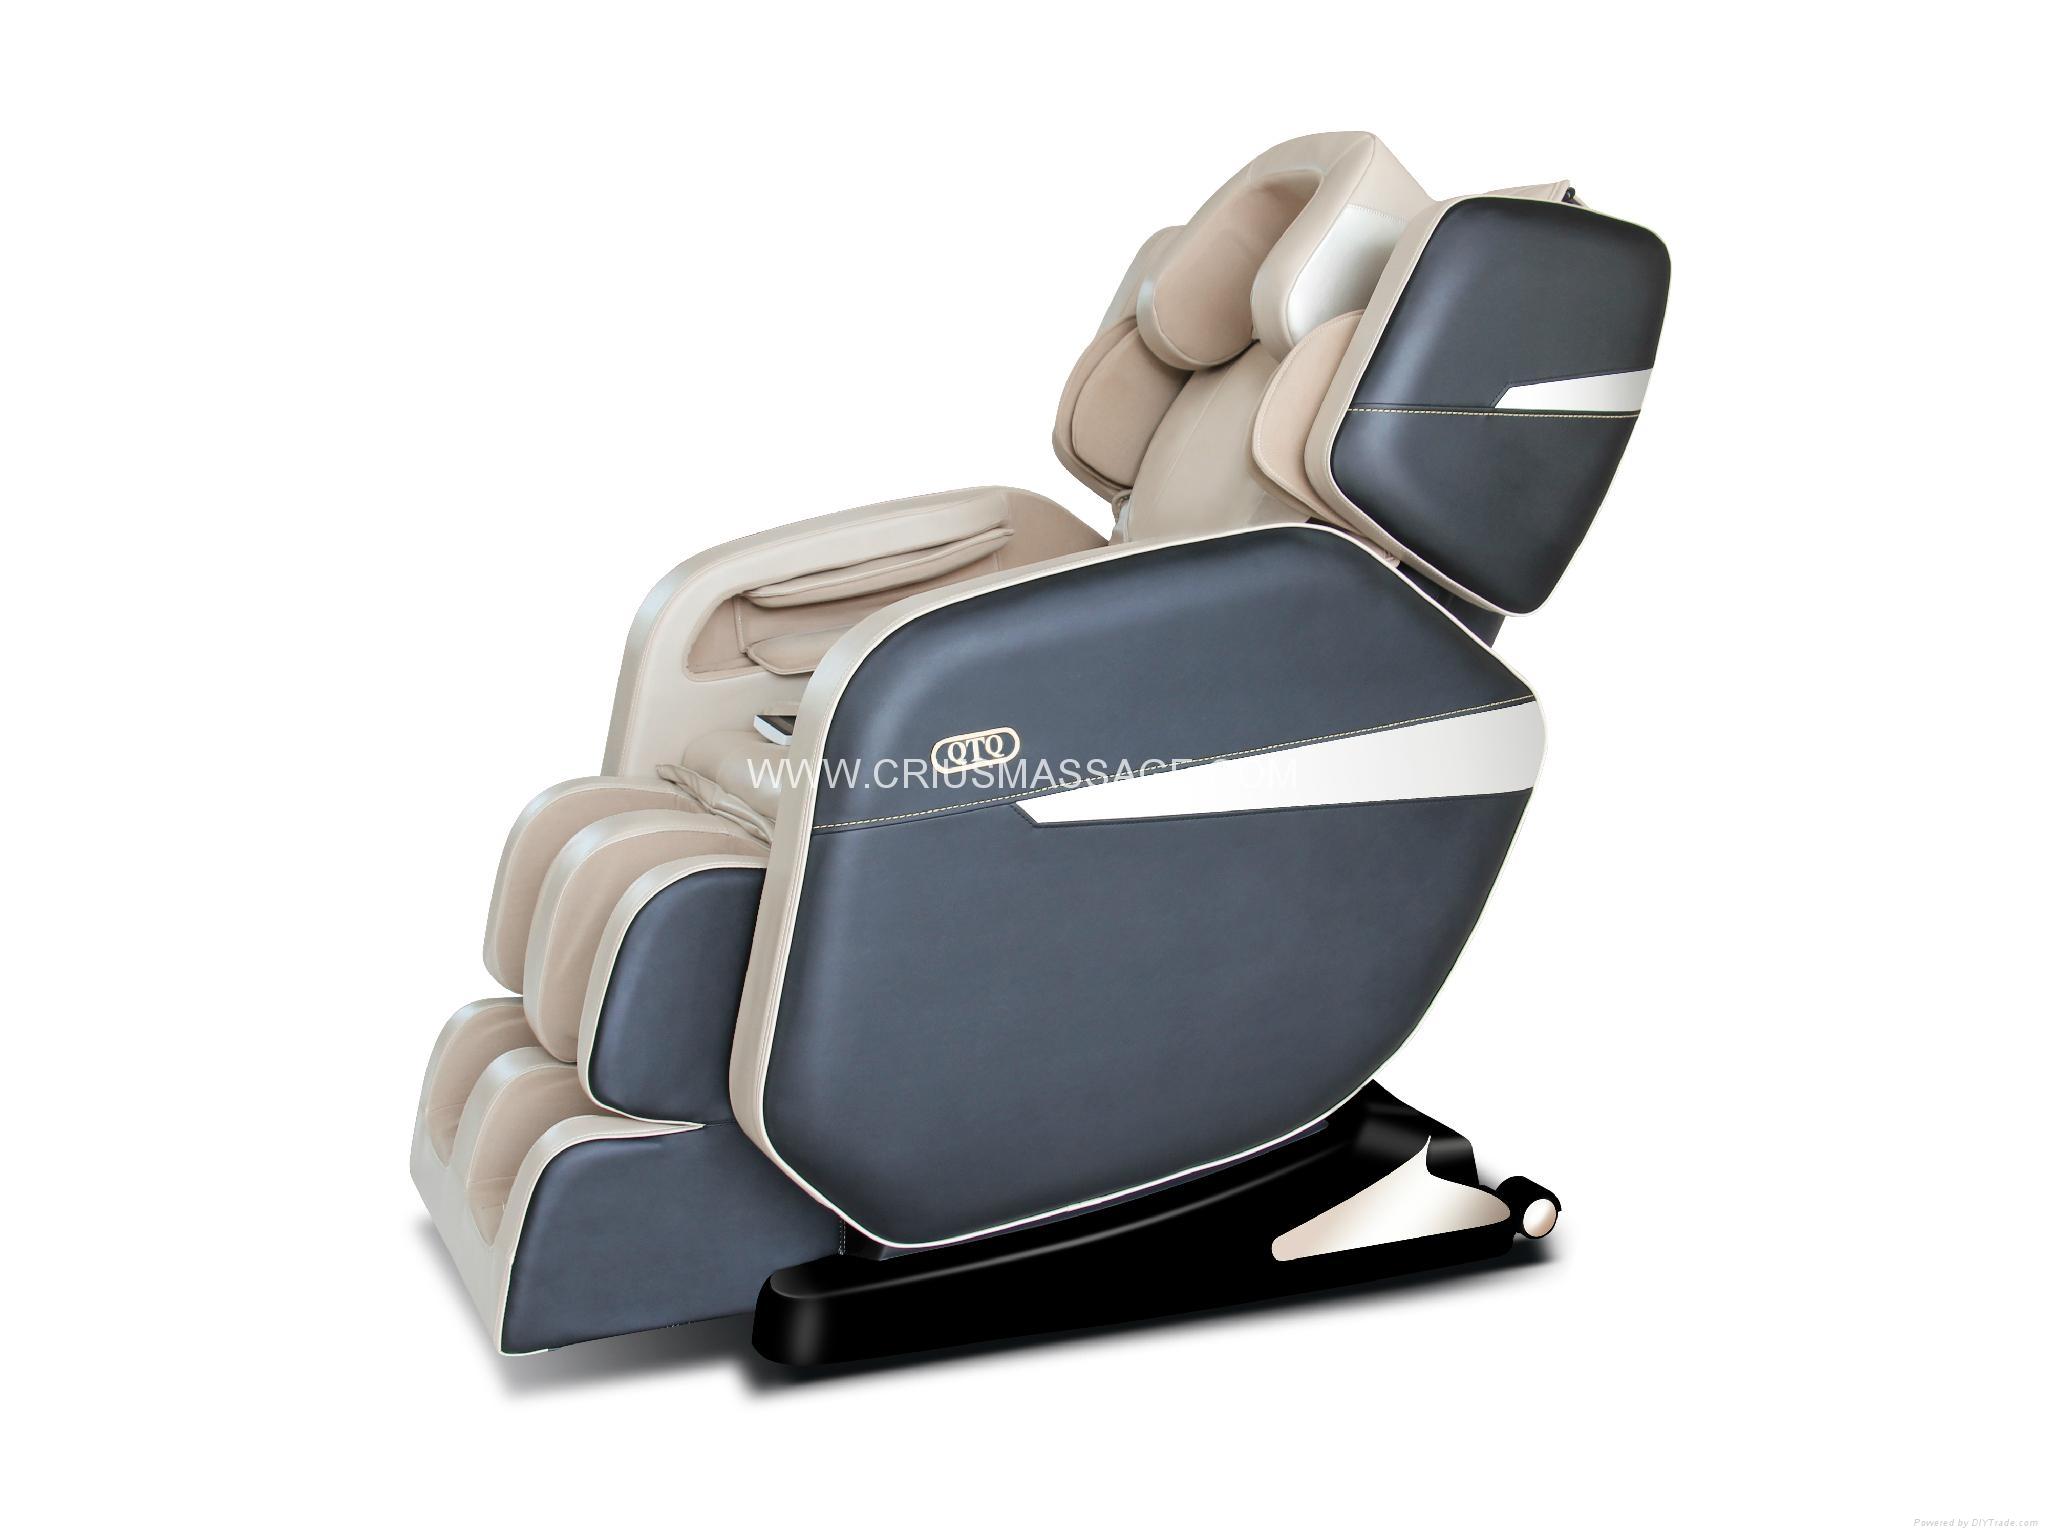 Top Quality Kneading Shiatsu Office Massage Chair